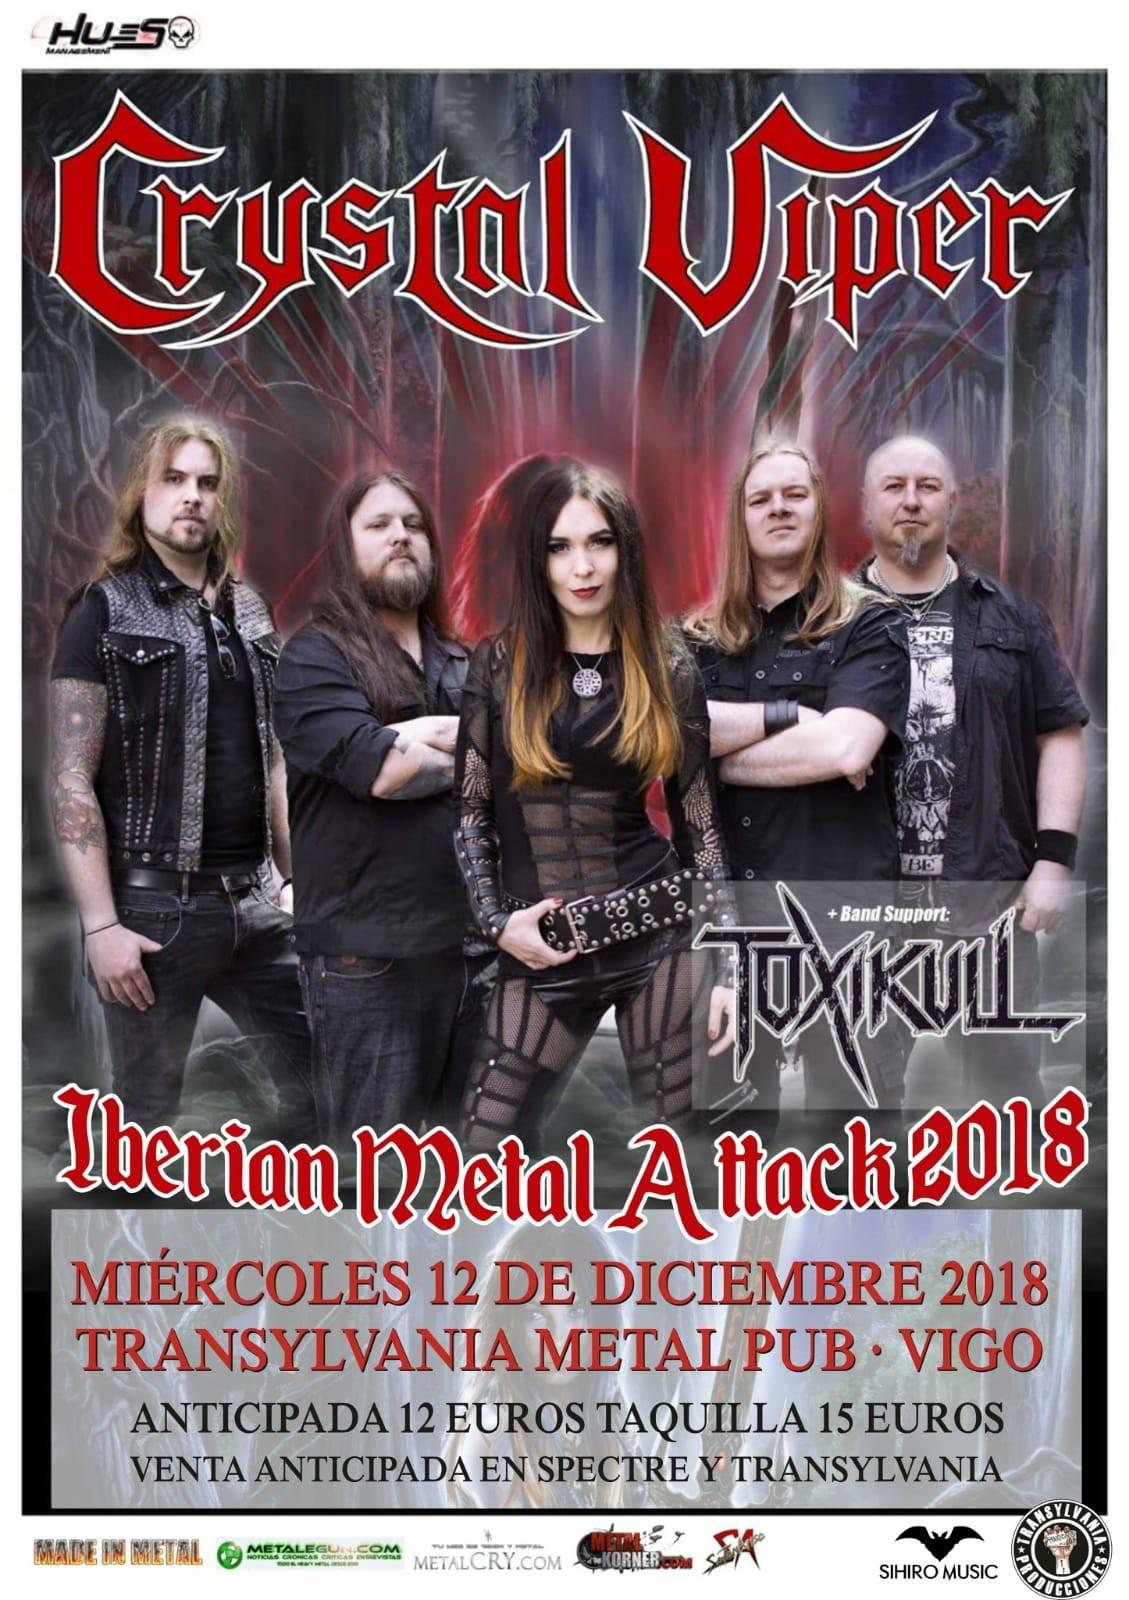 CRYSTAL VIPER + Toxikull (Vigo)